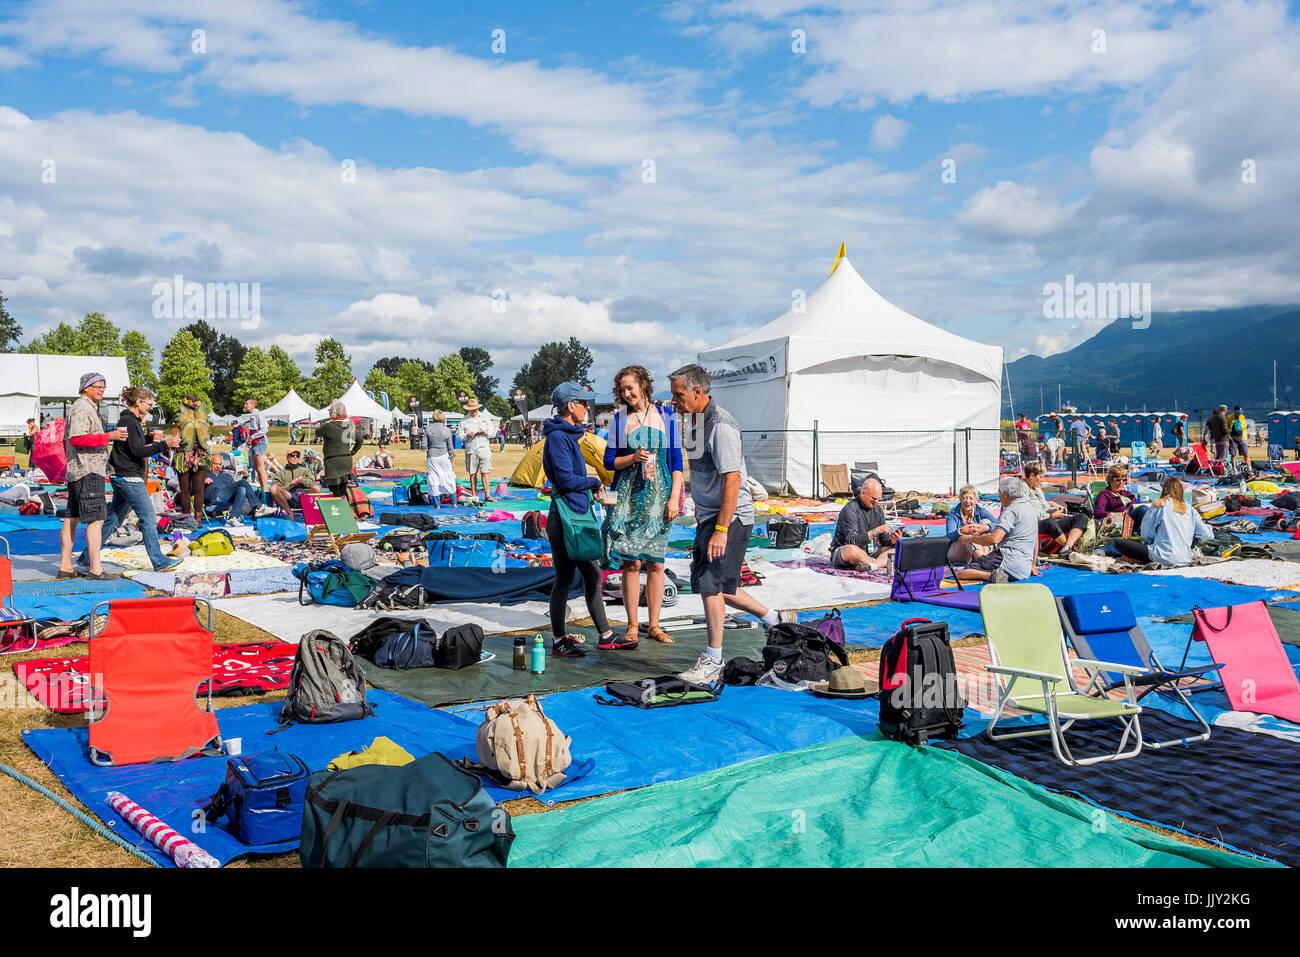 40ª anual Festival de Música Folk de Vancouver, Vancouver, British Columbia, Canadá. Imagen De Stock